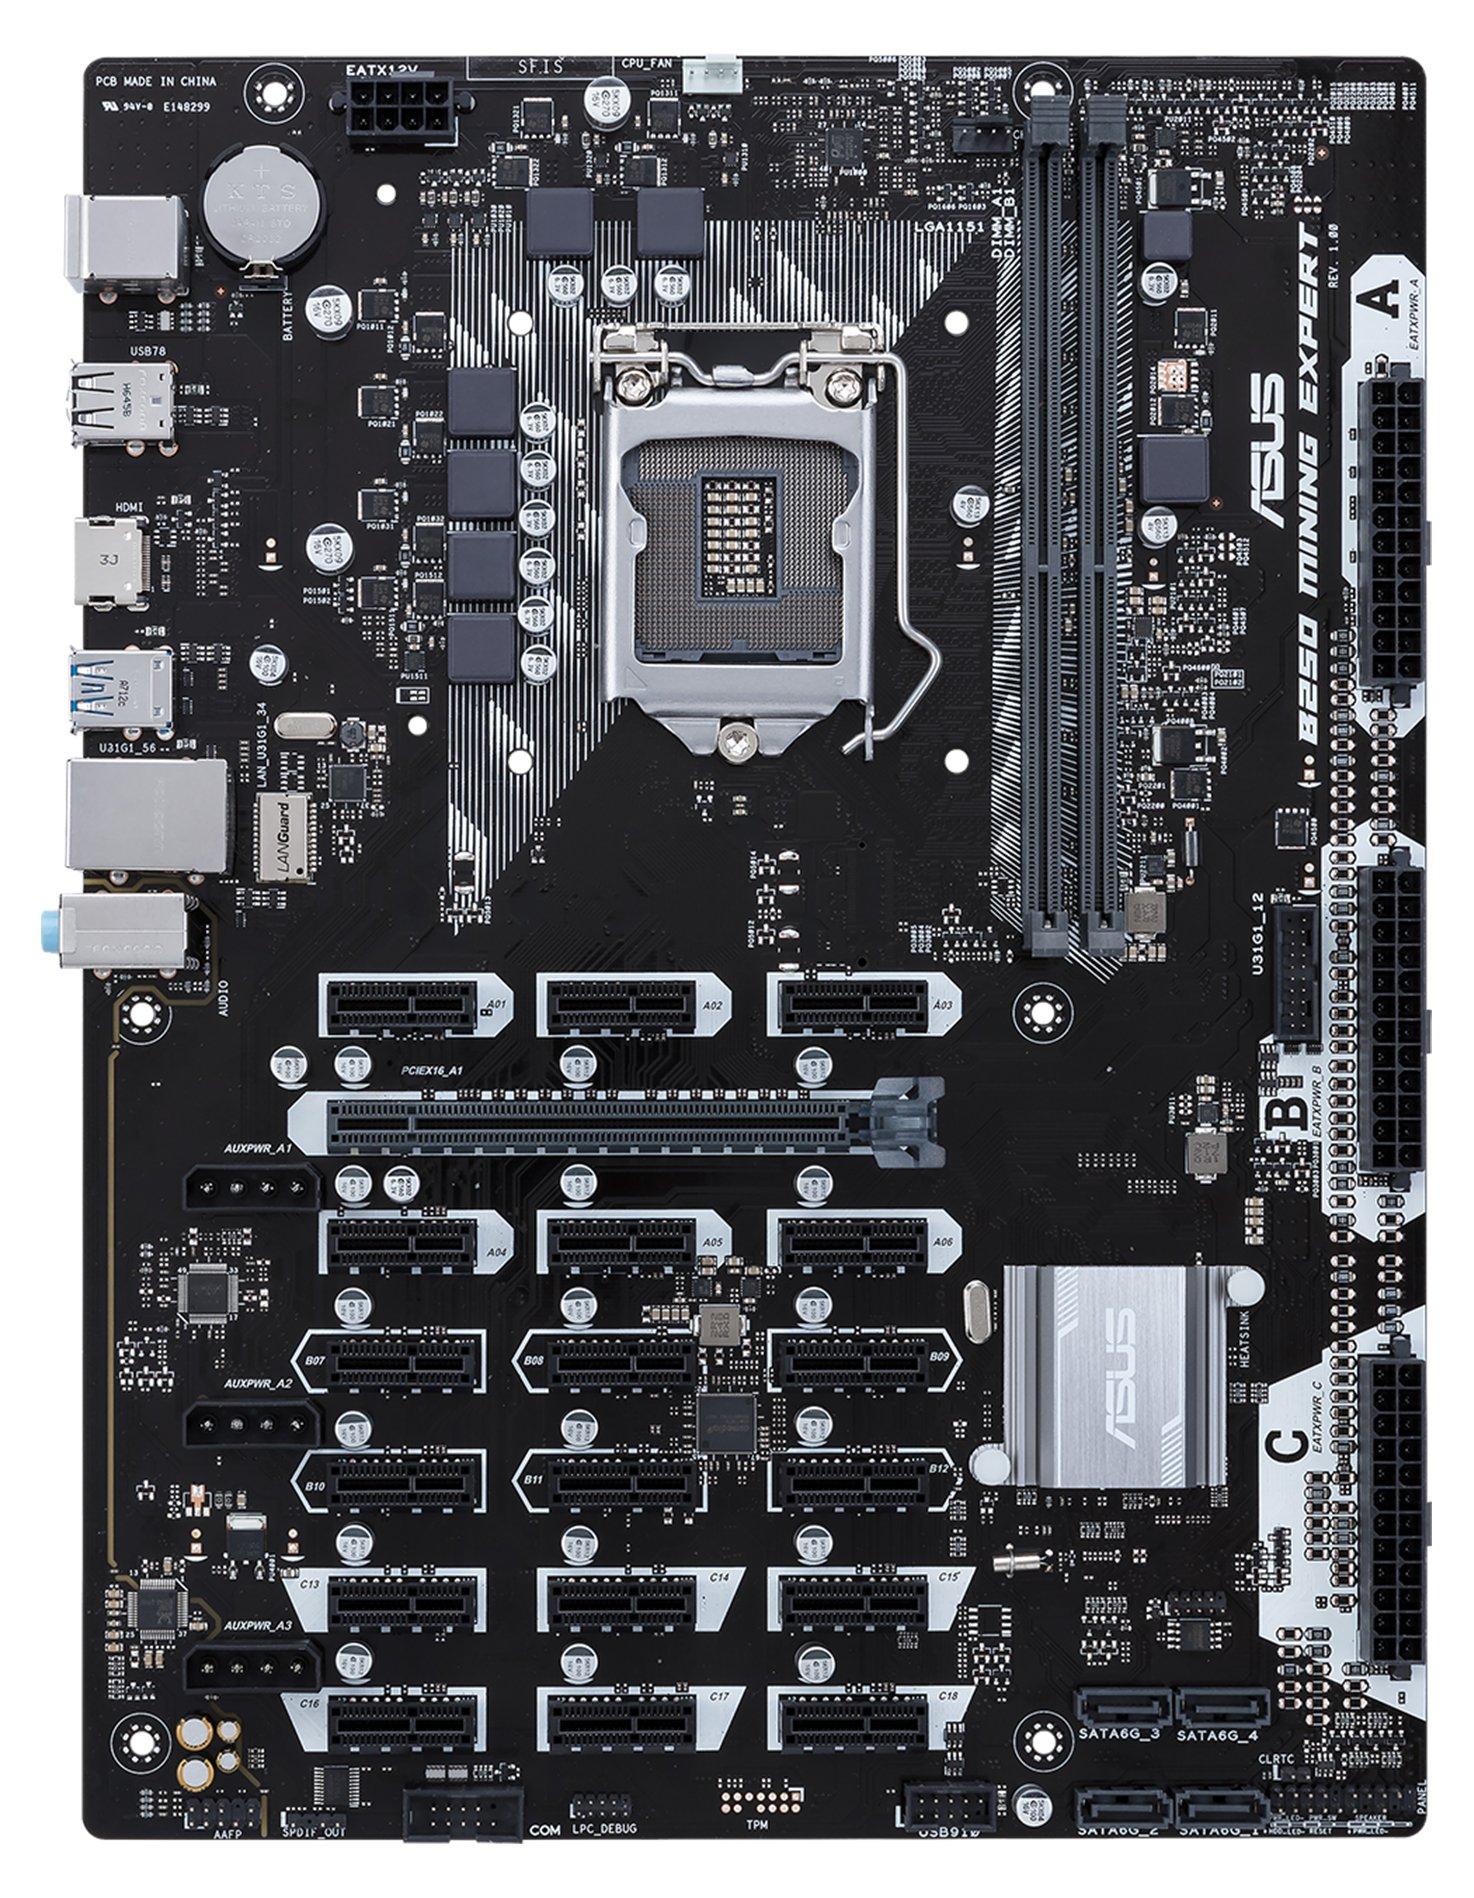 Motherboard Para Mineria De Bitcoin Asus B250 Lga1151 Ddr4